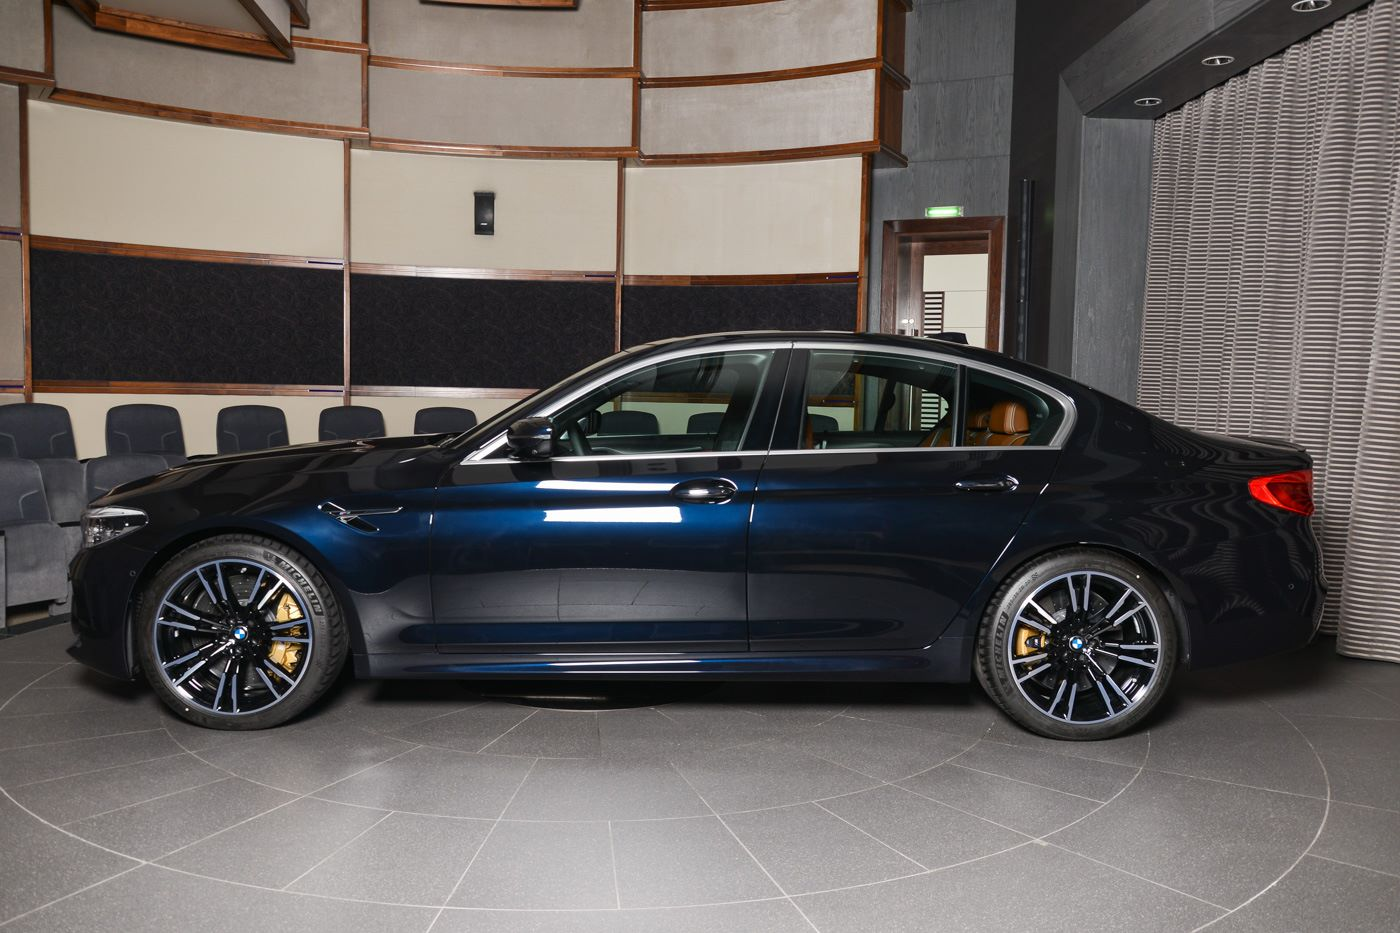 2019 - [BMW] Série 8 Gran Coupé [G16] - Page 7 BMW-M5-F90-Individual-Azuritschwarz-Metallic-04